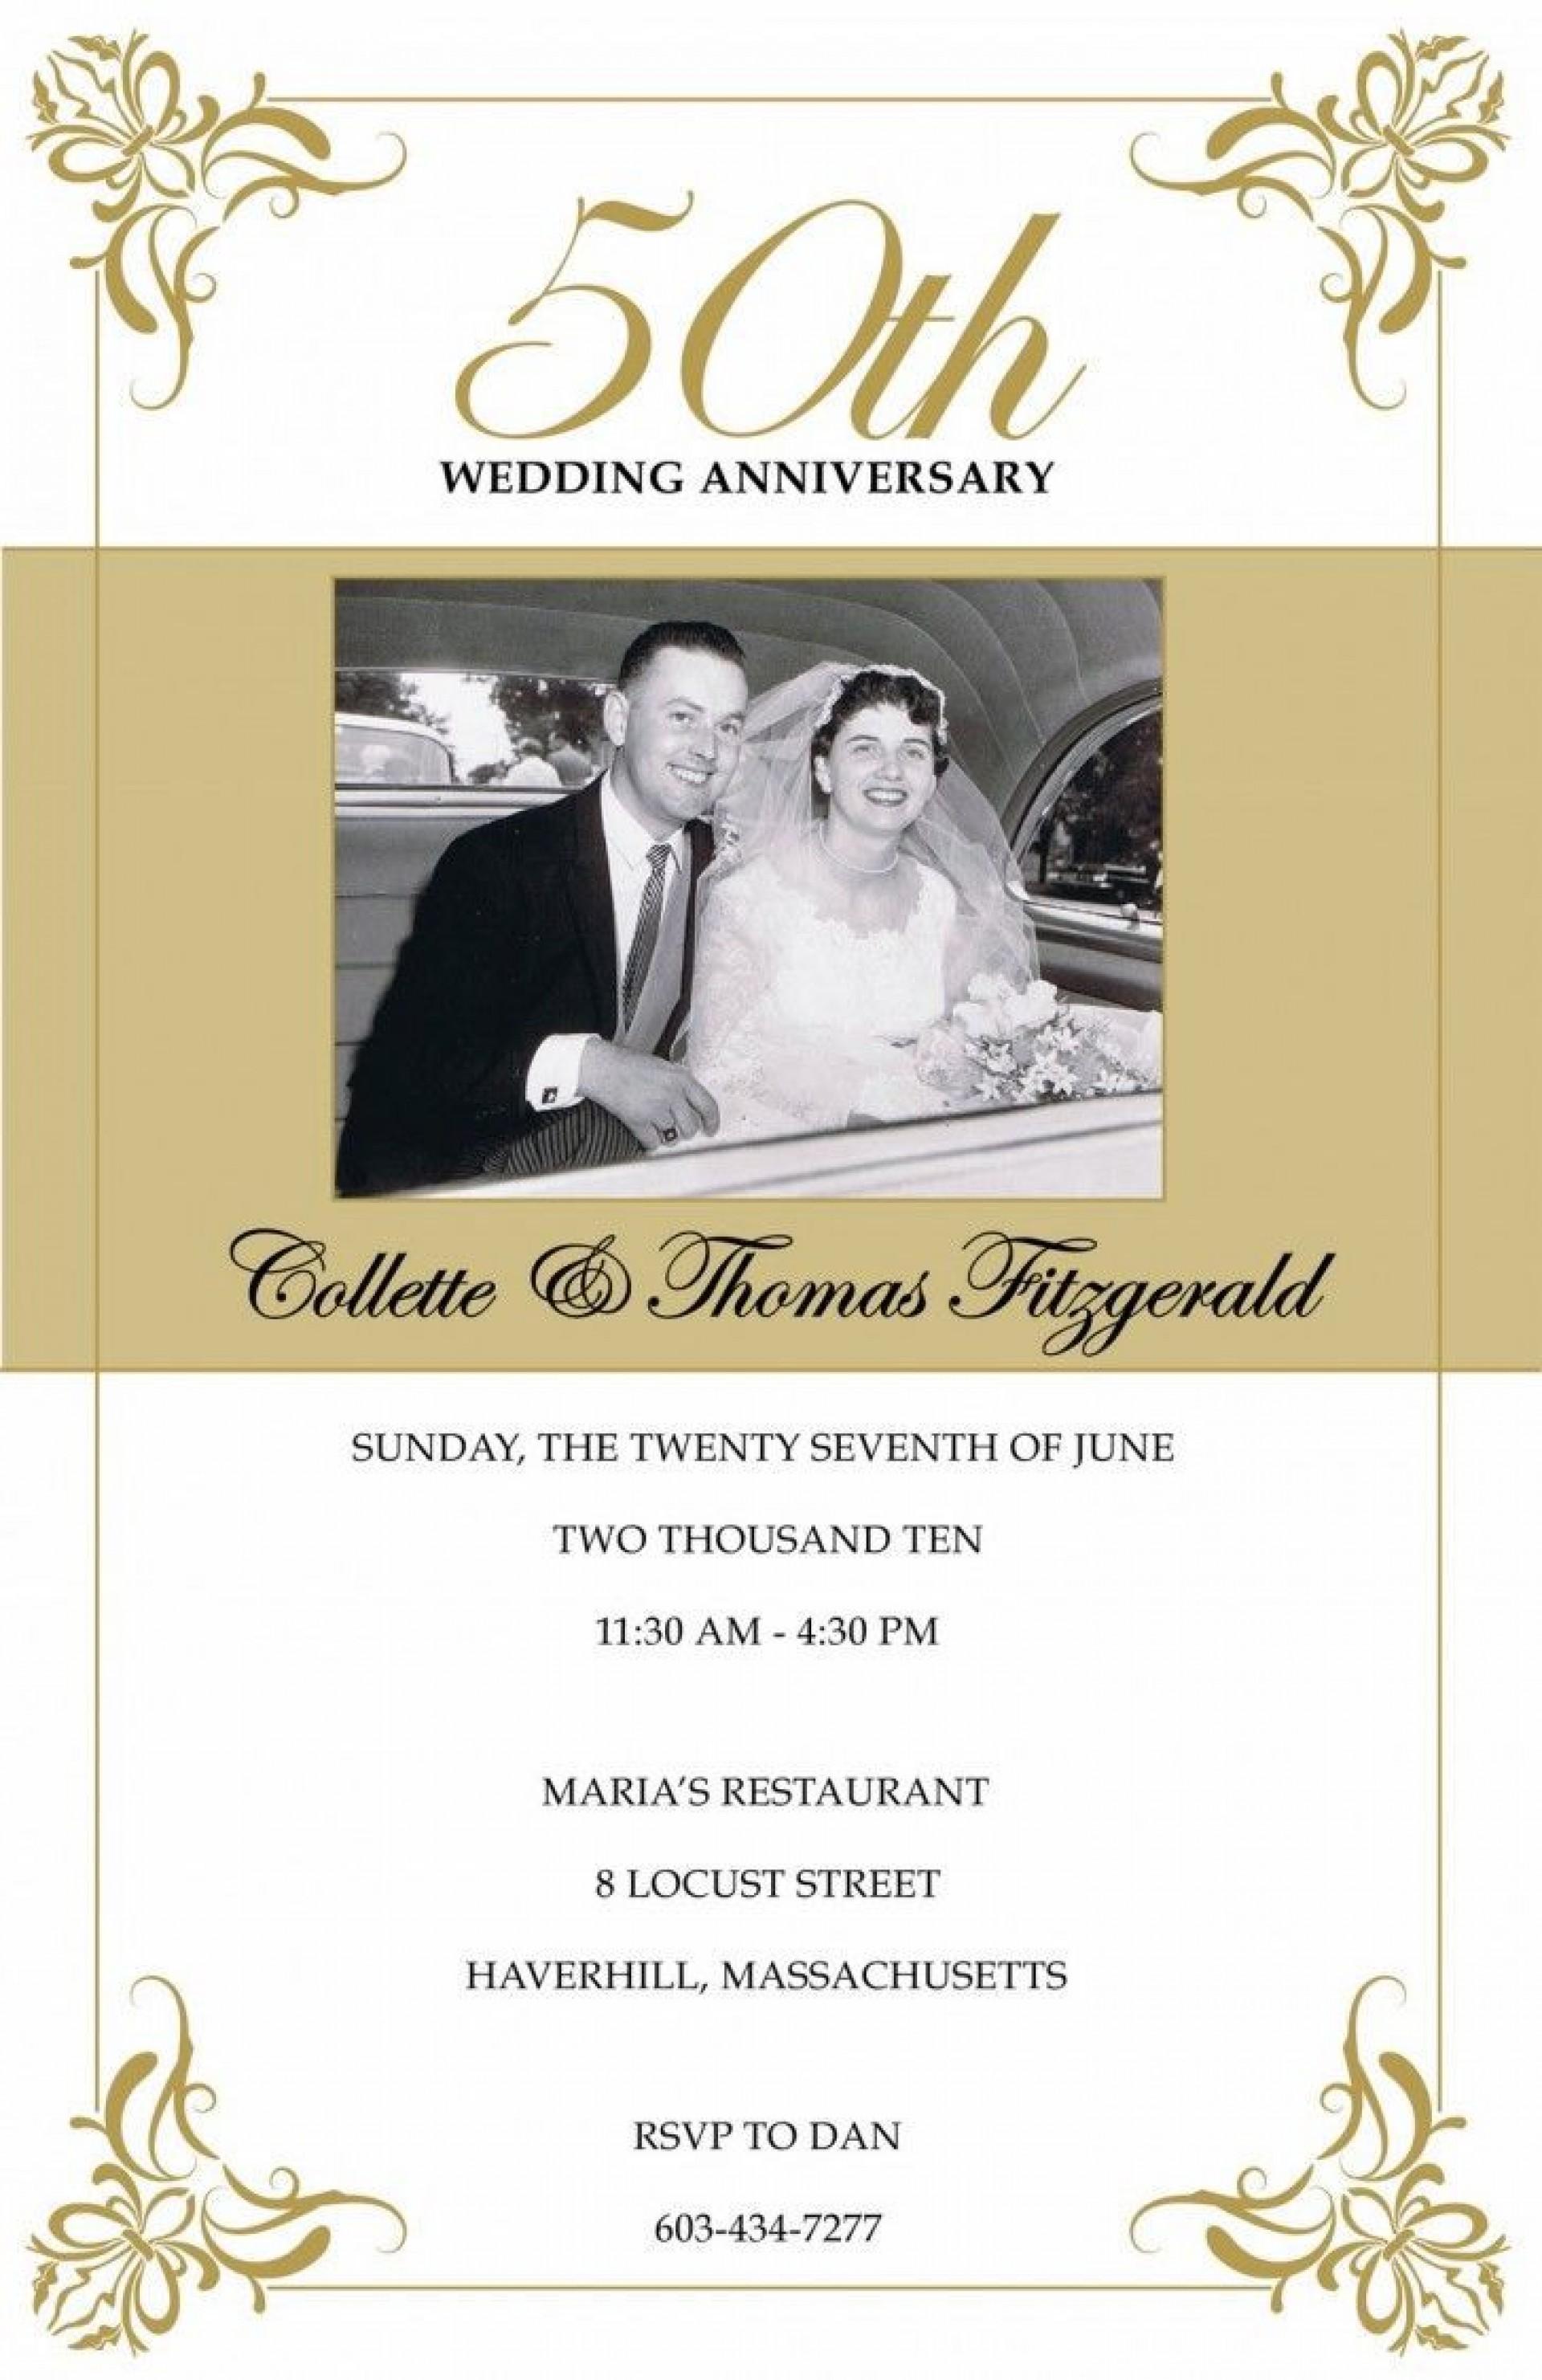 006 Shocking 50th Anniversary Invitation Wording Sample  Samples Wedding Card1920